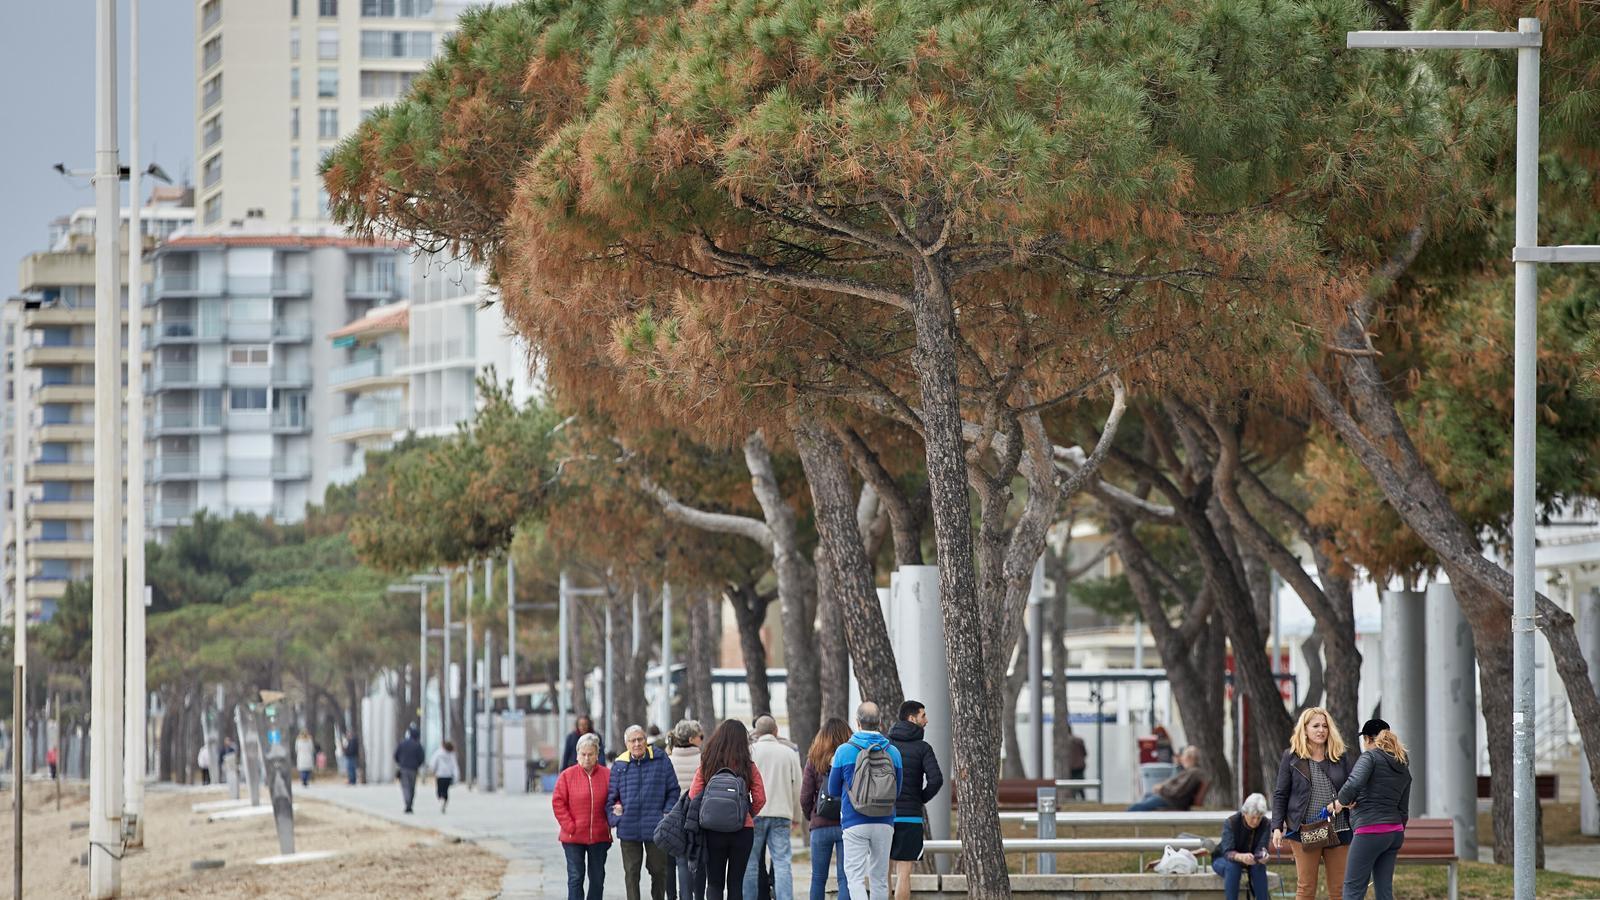 Desenes de persones passegen pel passeig marítim de Castell-Platja d'Aro